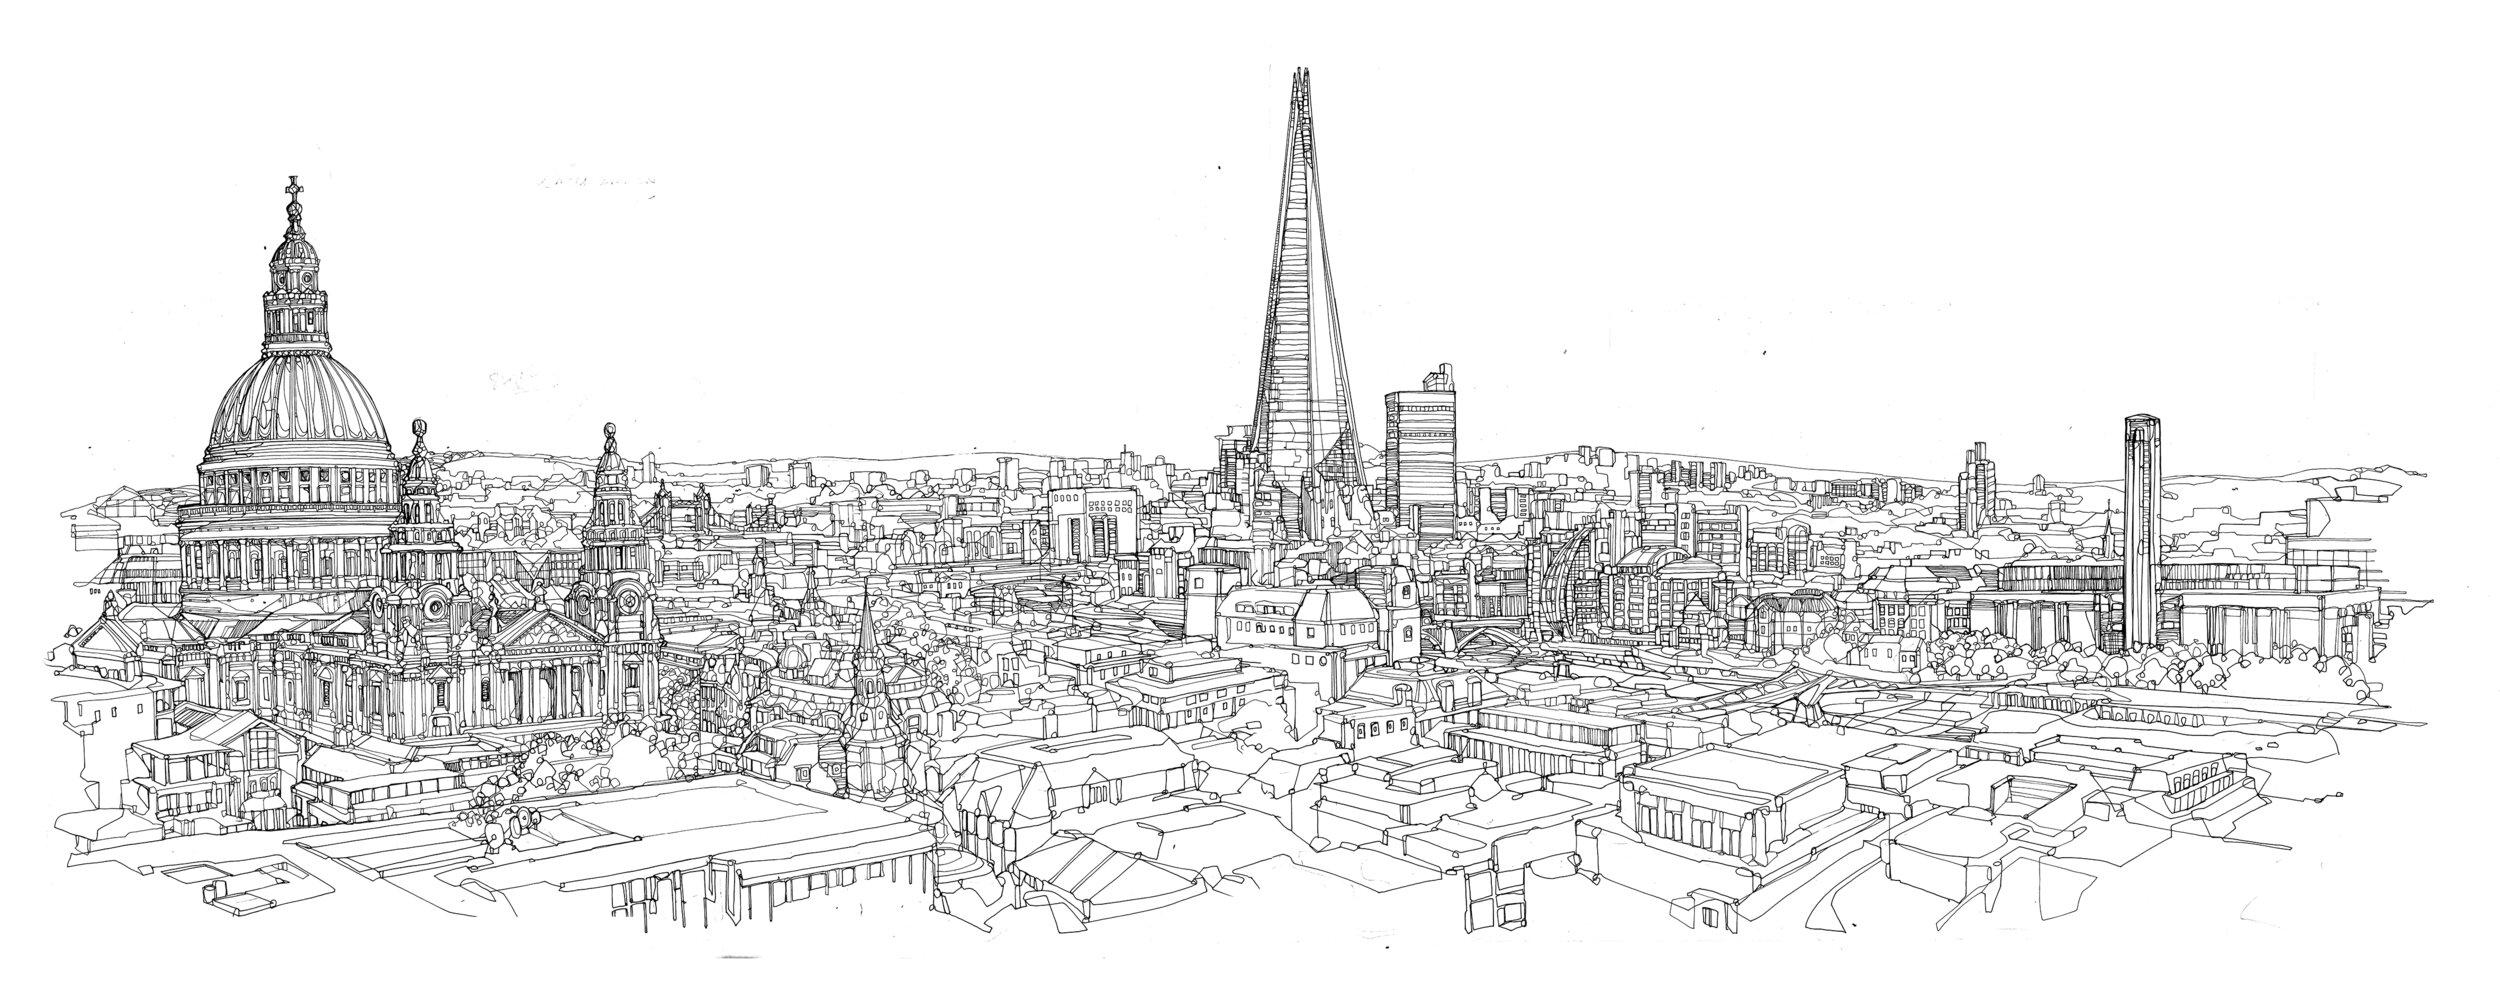 new londonline 2.jpg